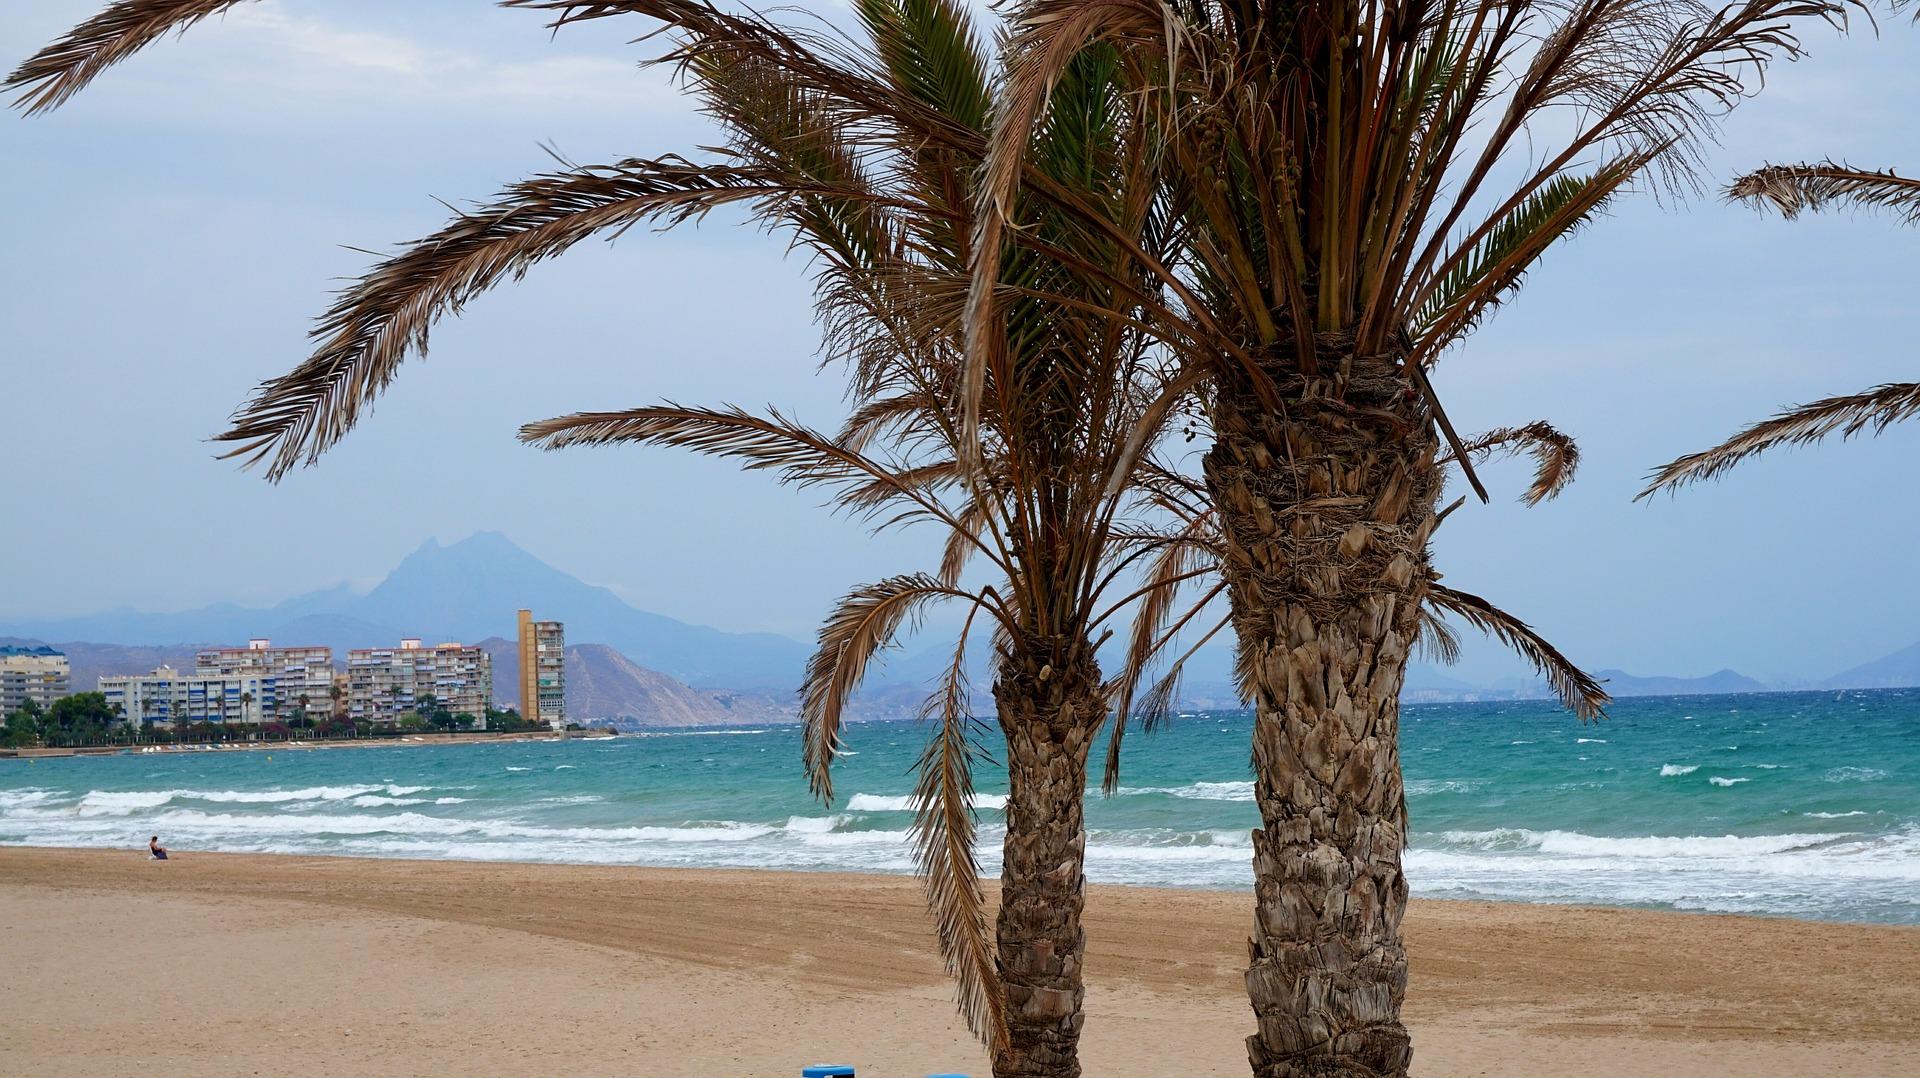 Alicante - der wärmste Ort im Winter in Europa